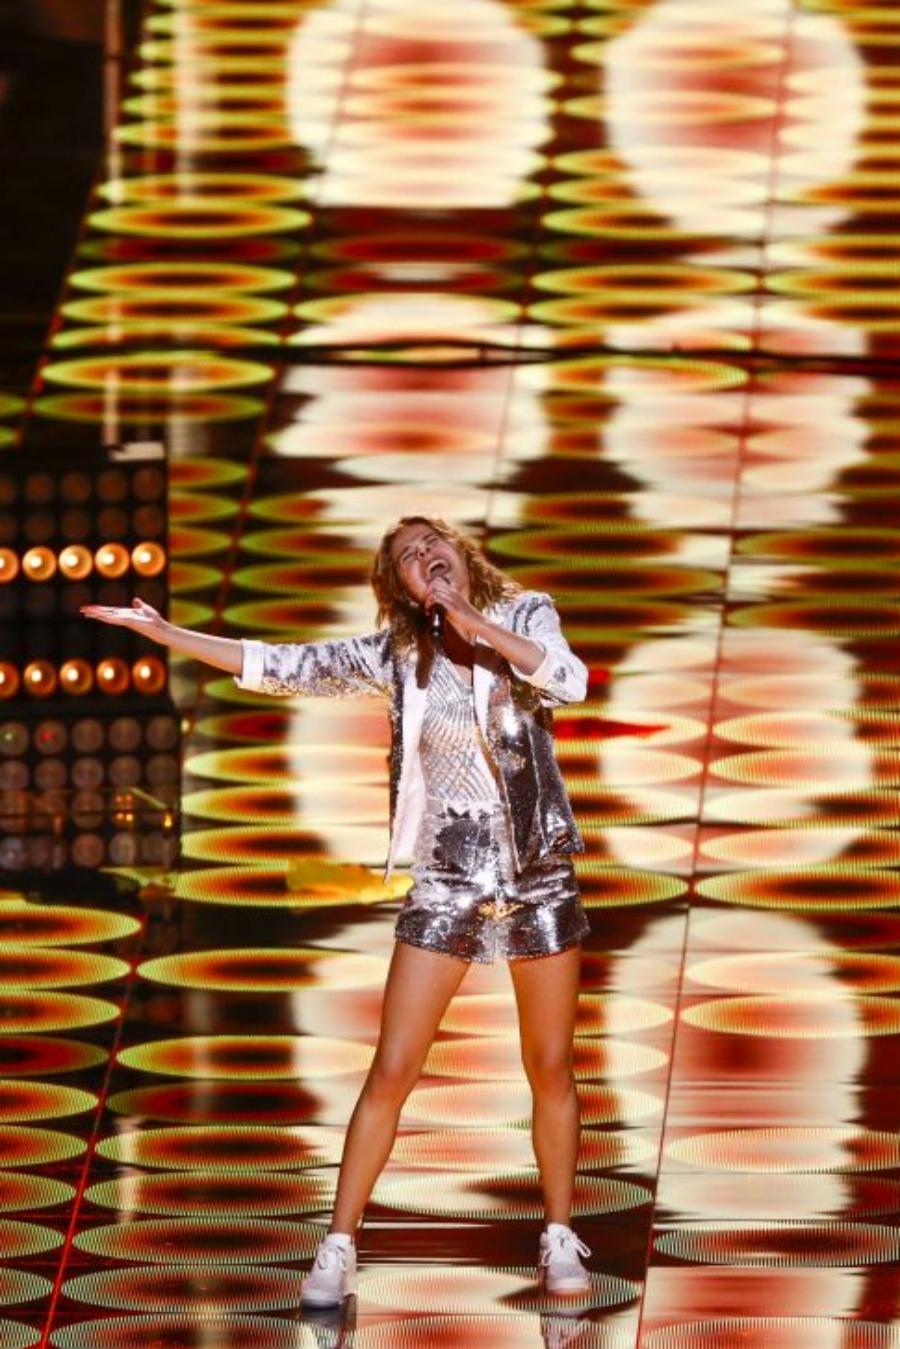 Eurovision Song Contest 2016: Belgium